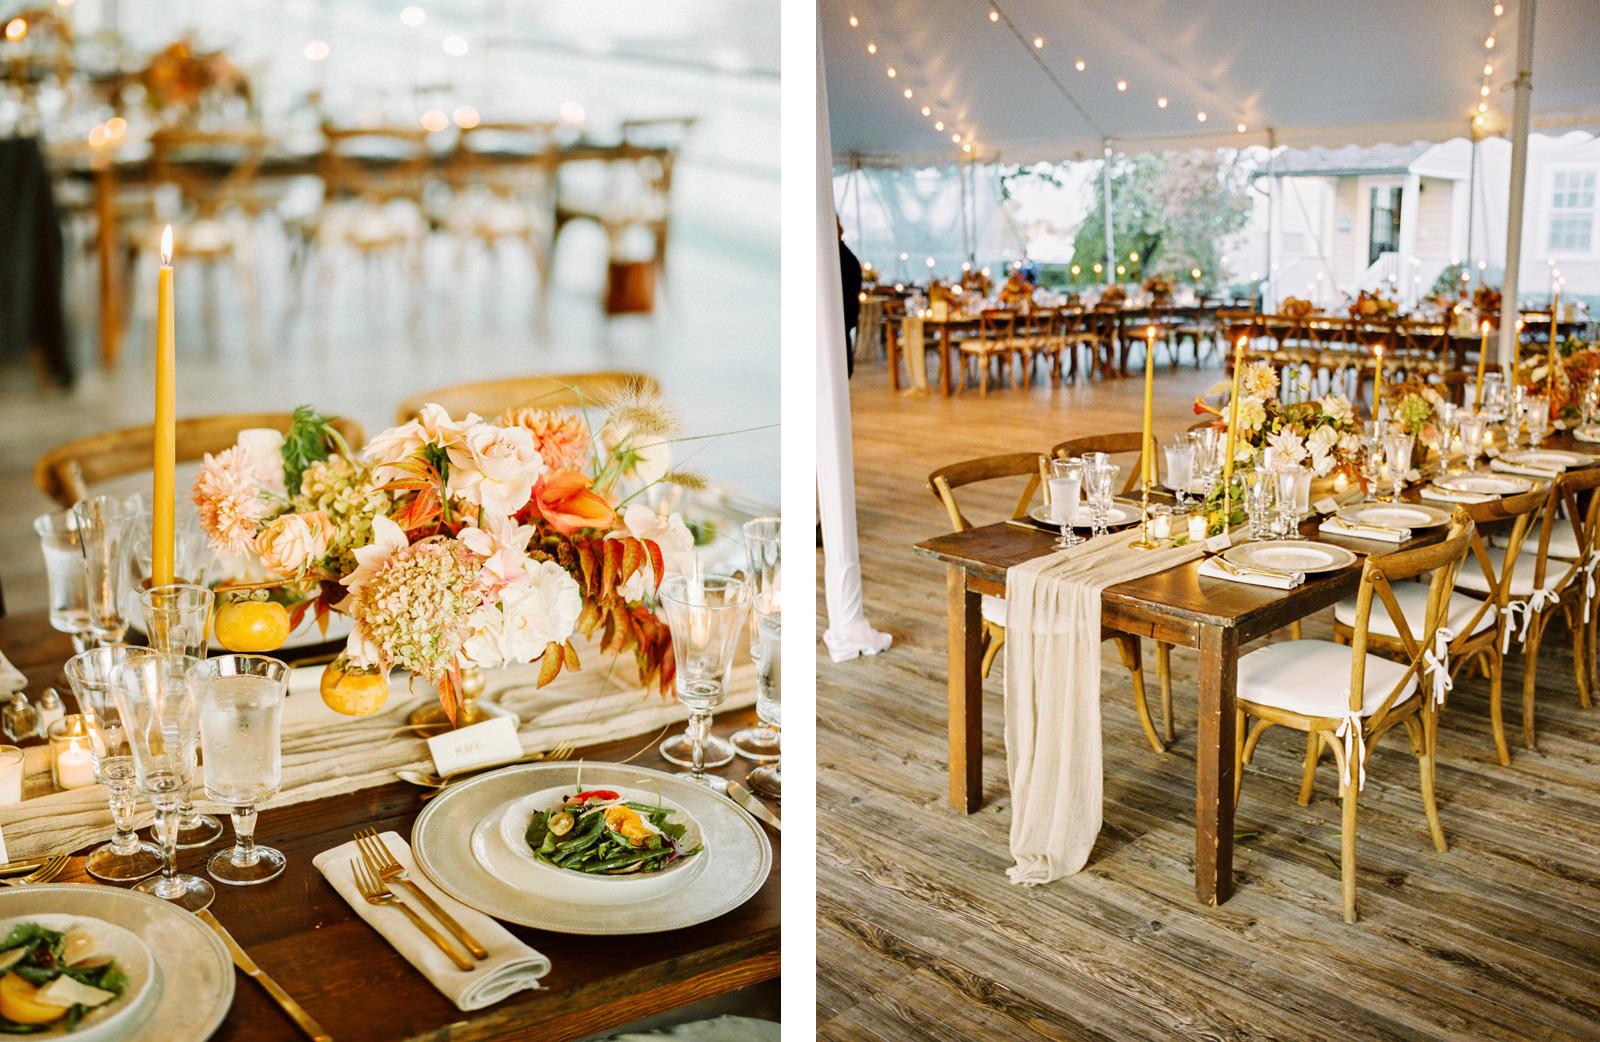 bridgeport-wedding-130 BRIDGEPORT, CONNECTICUT BACKYARD WEDDING